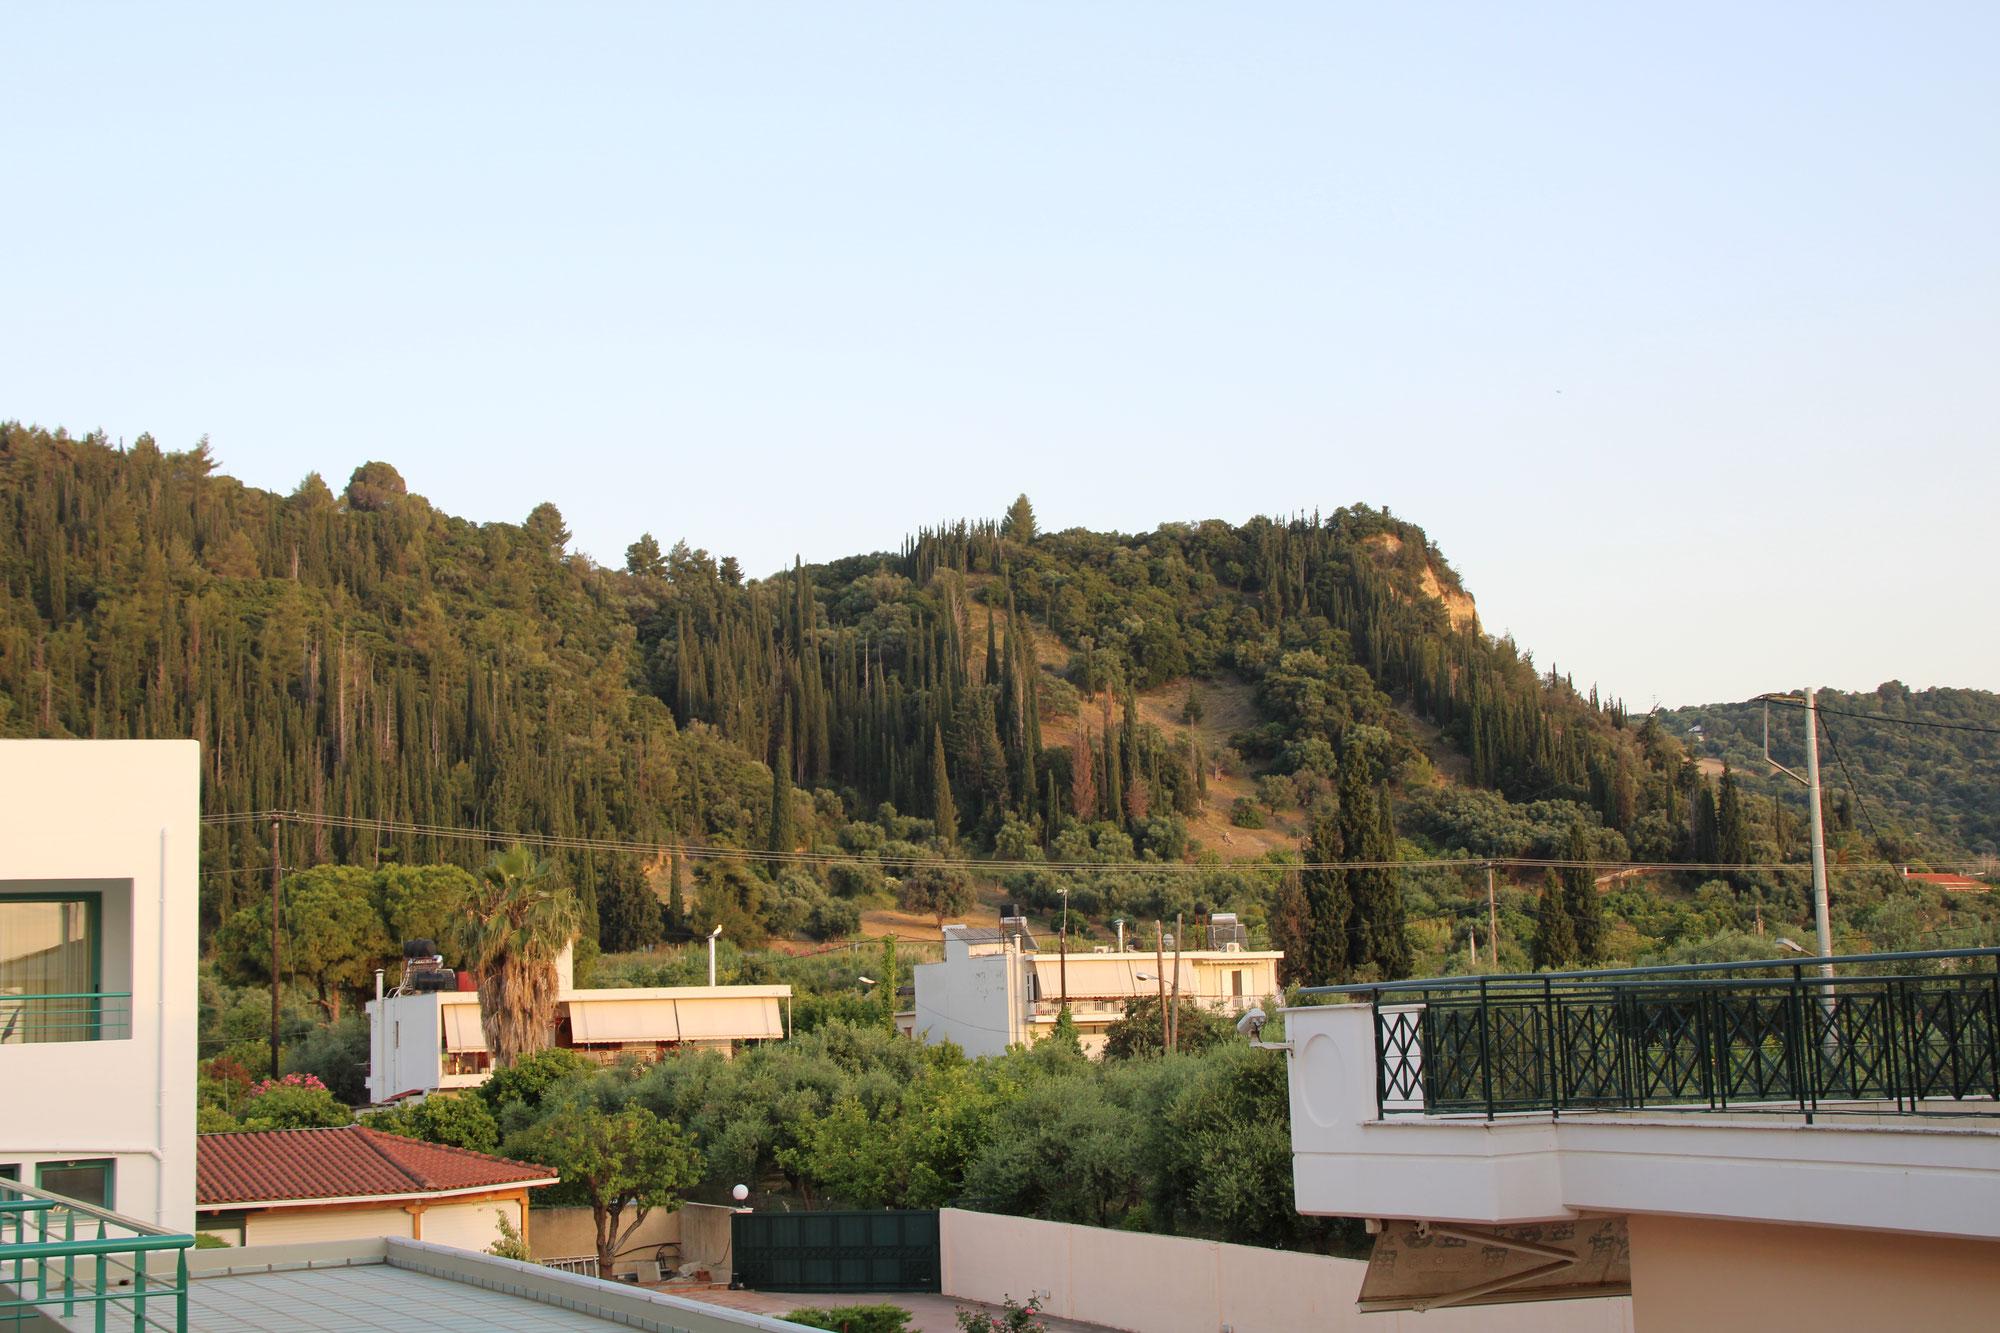 Peloponnes Tour - Ankunft in Griechenland